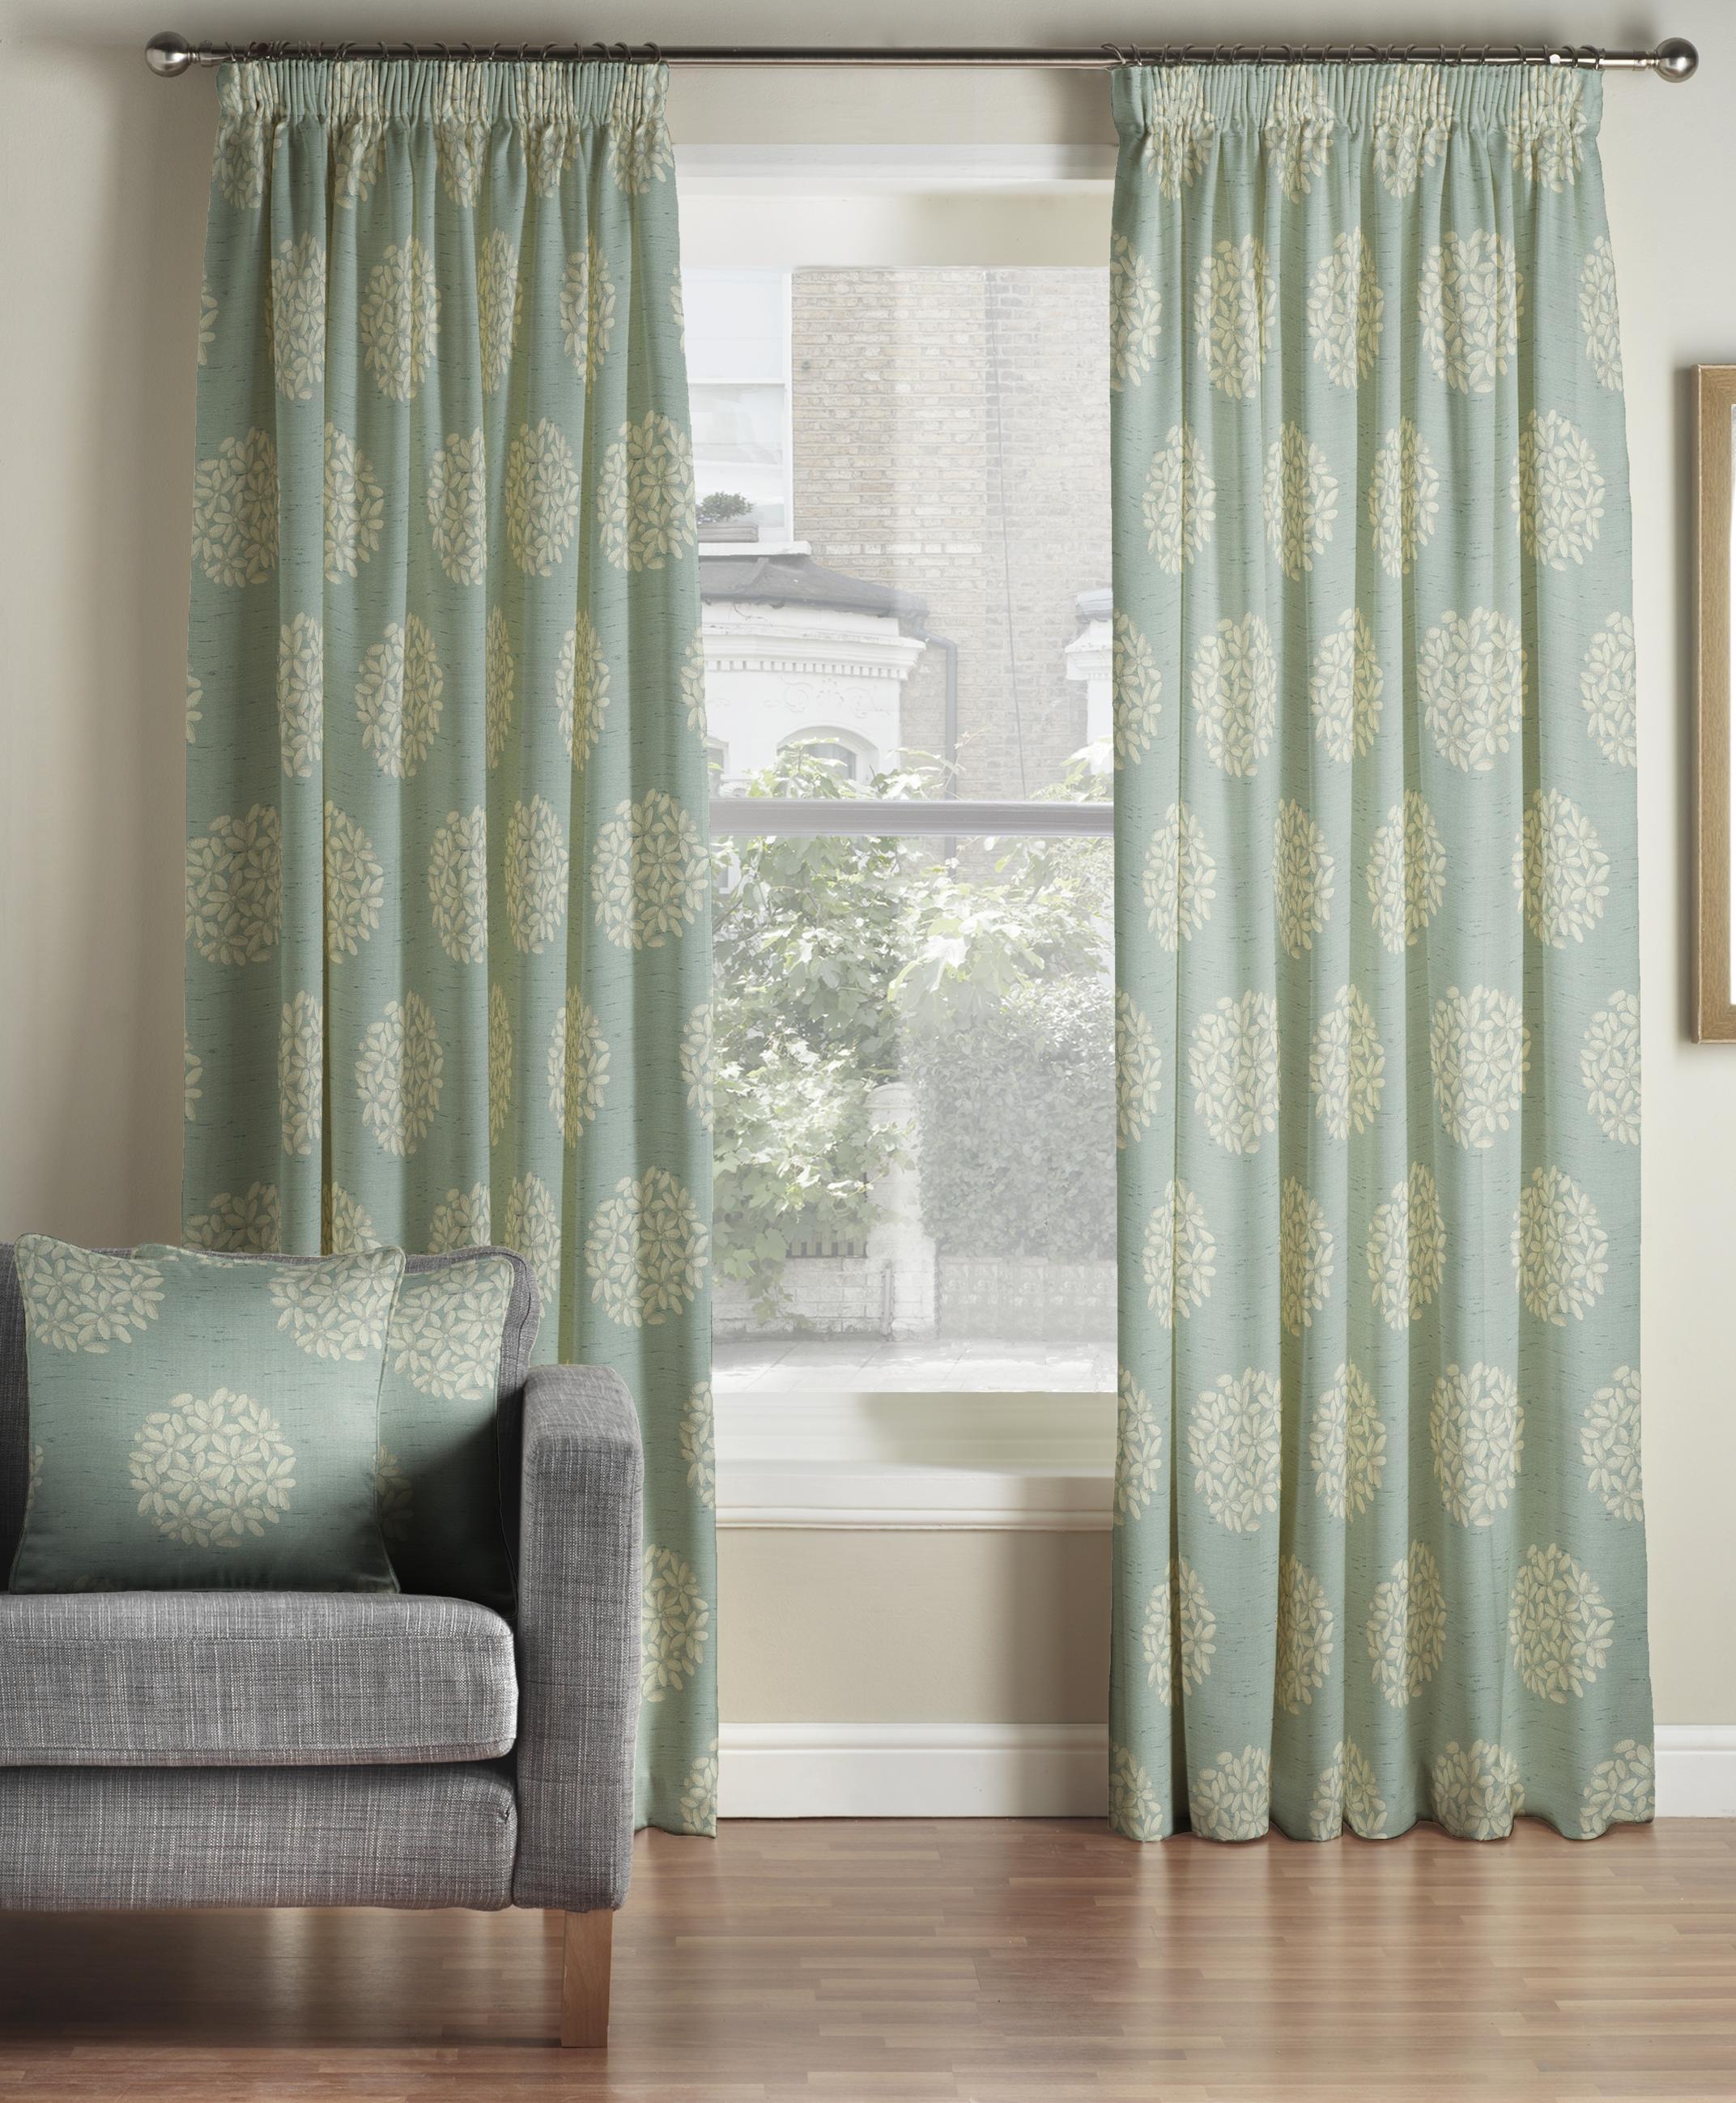 Pom Pom Curtains Curtains At Home